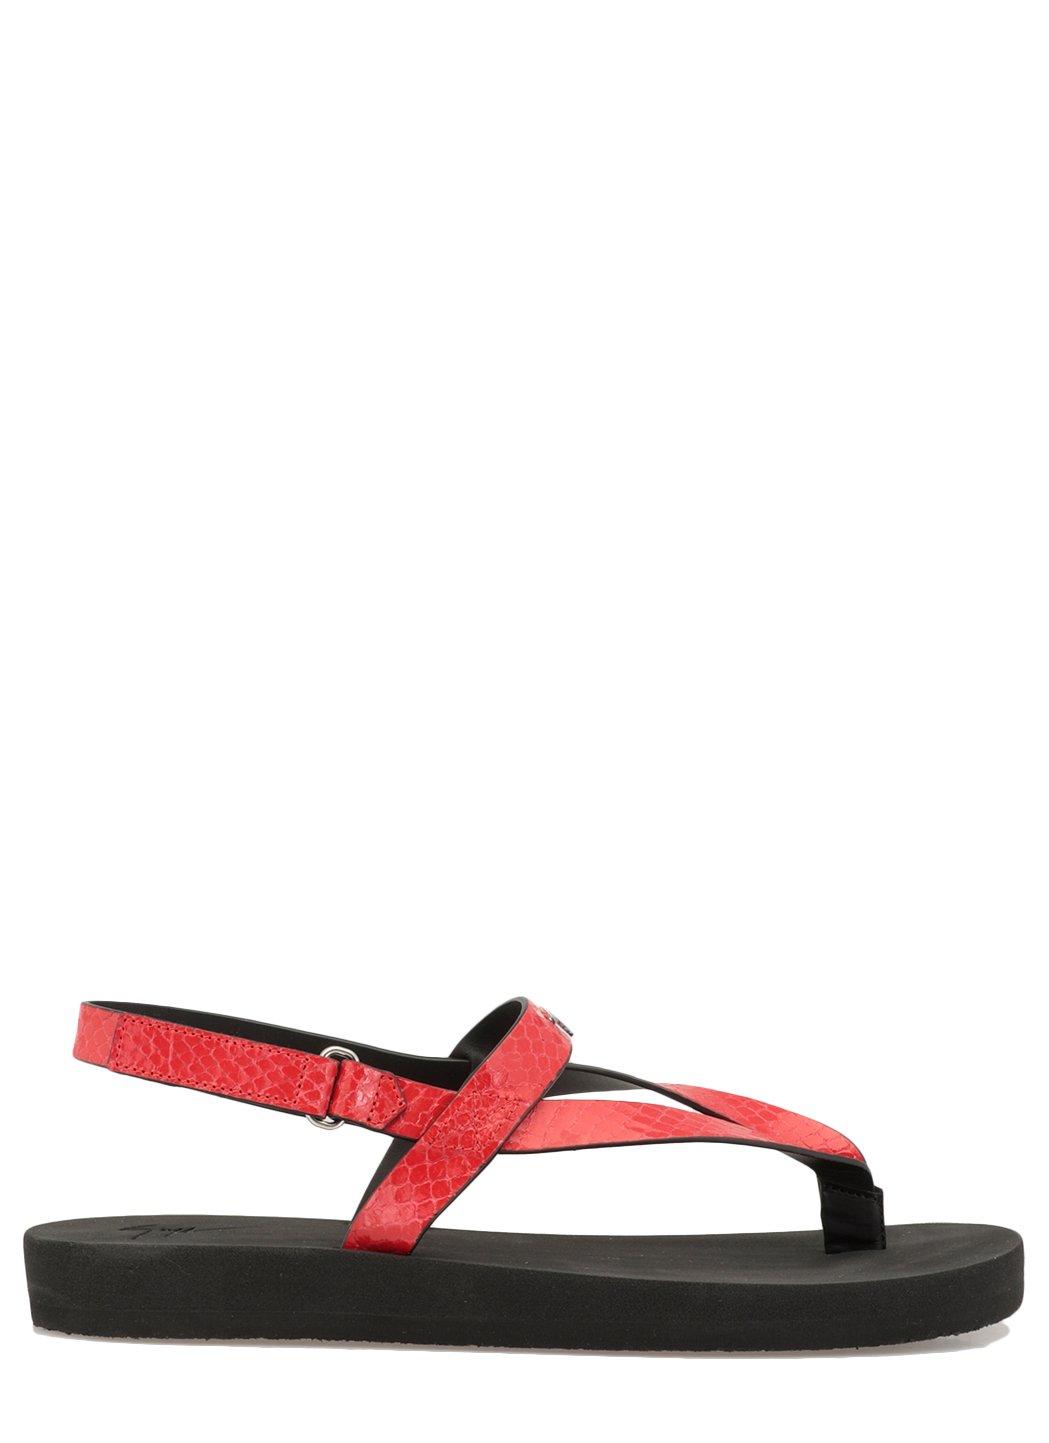 Giuseppe Zanotti Sandals Red